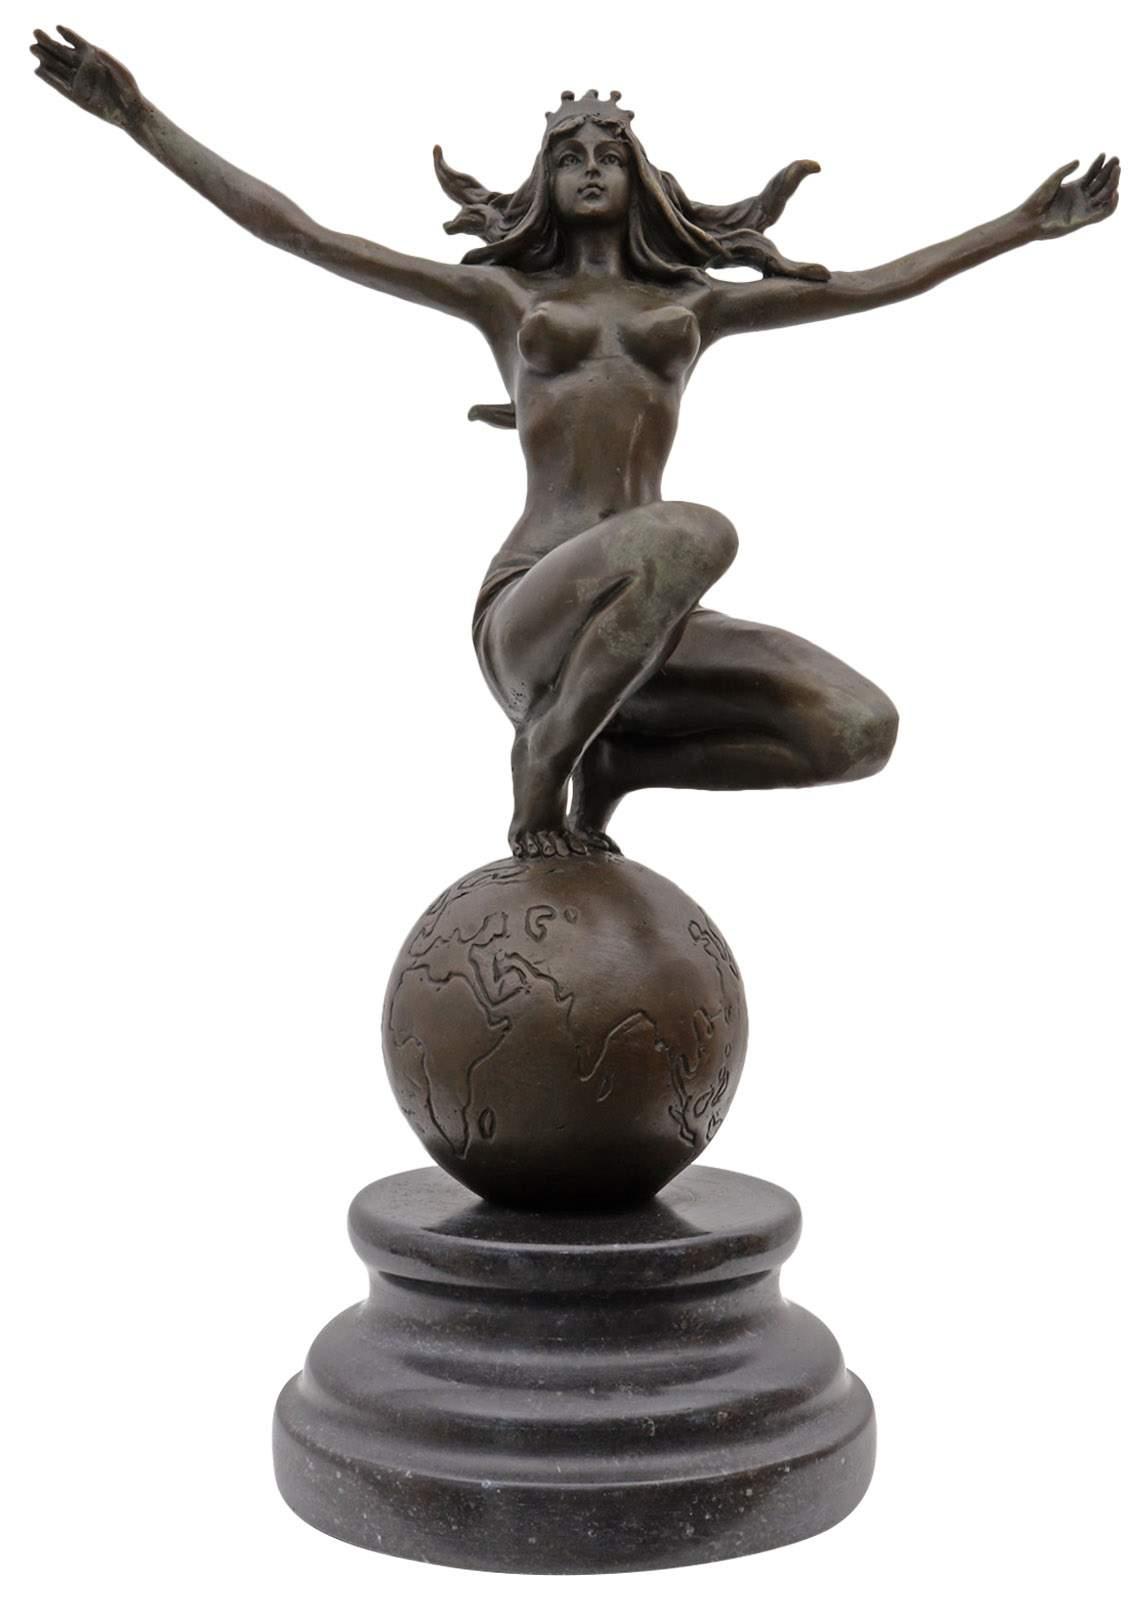 bronzefiguren garten neu bronzeskulptur frau weltkugel im antik stil bronze figur statue 25cm of bronzefiguren garten